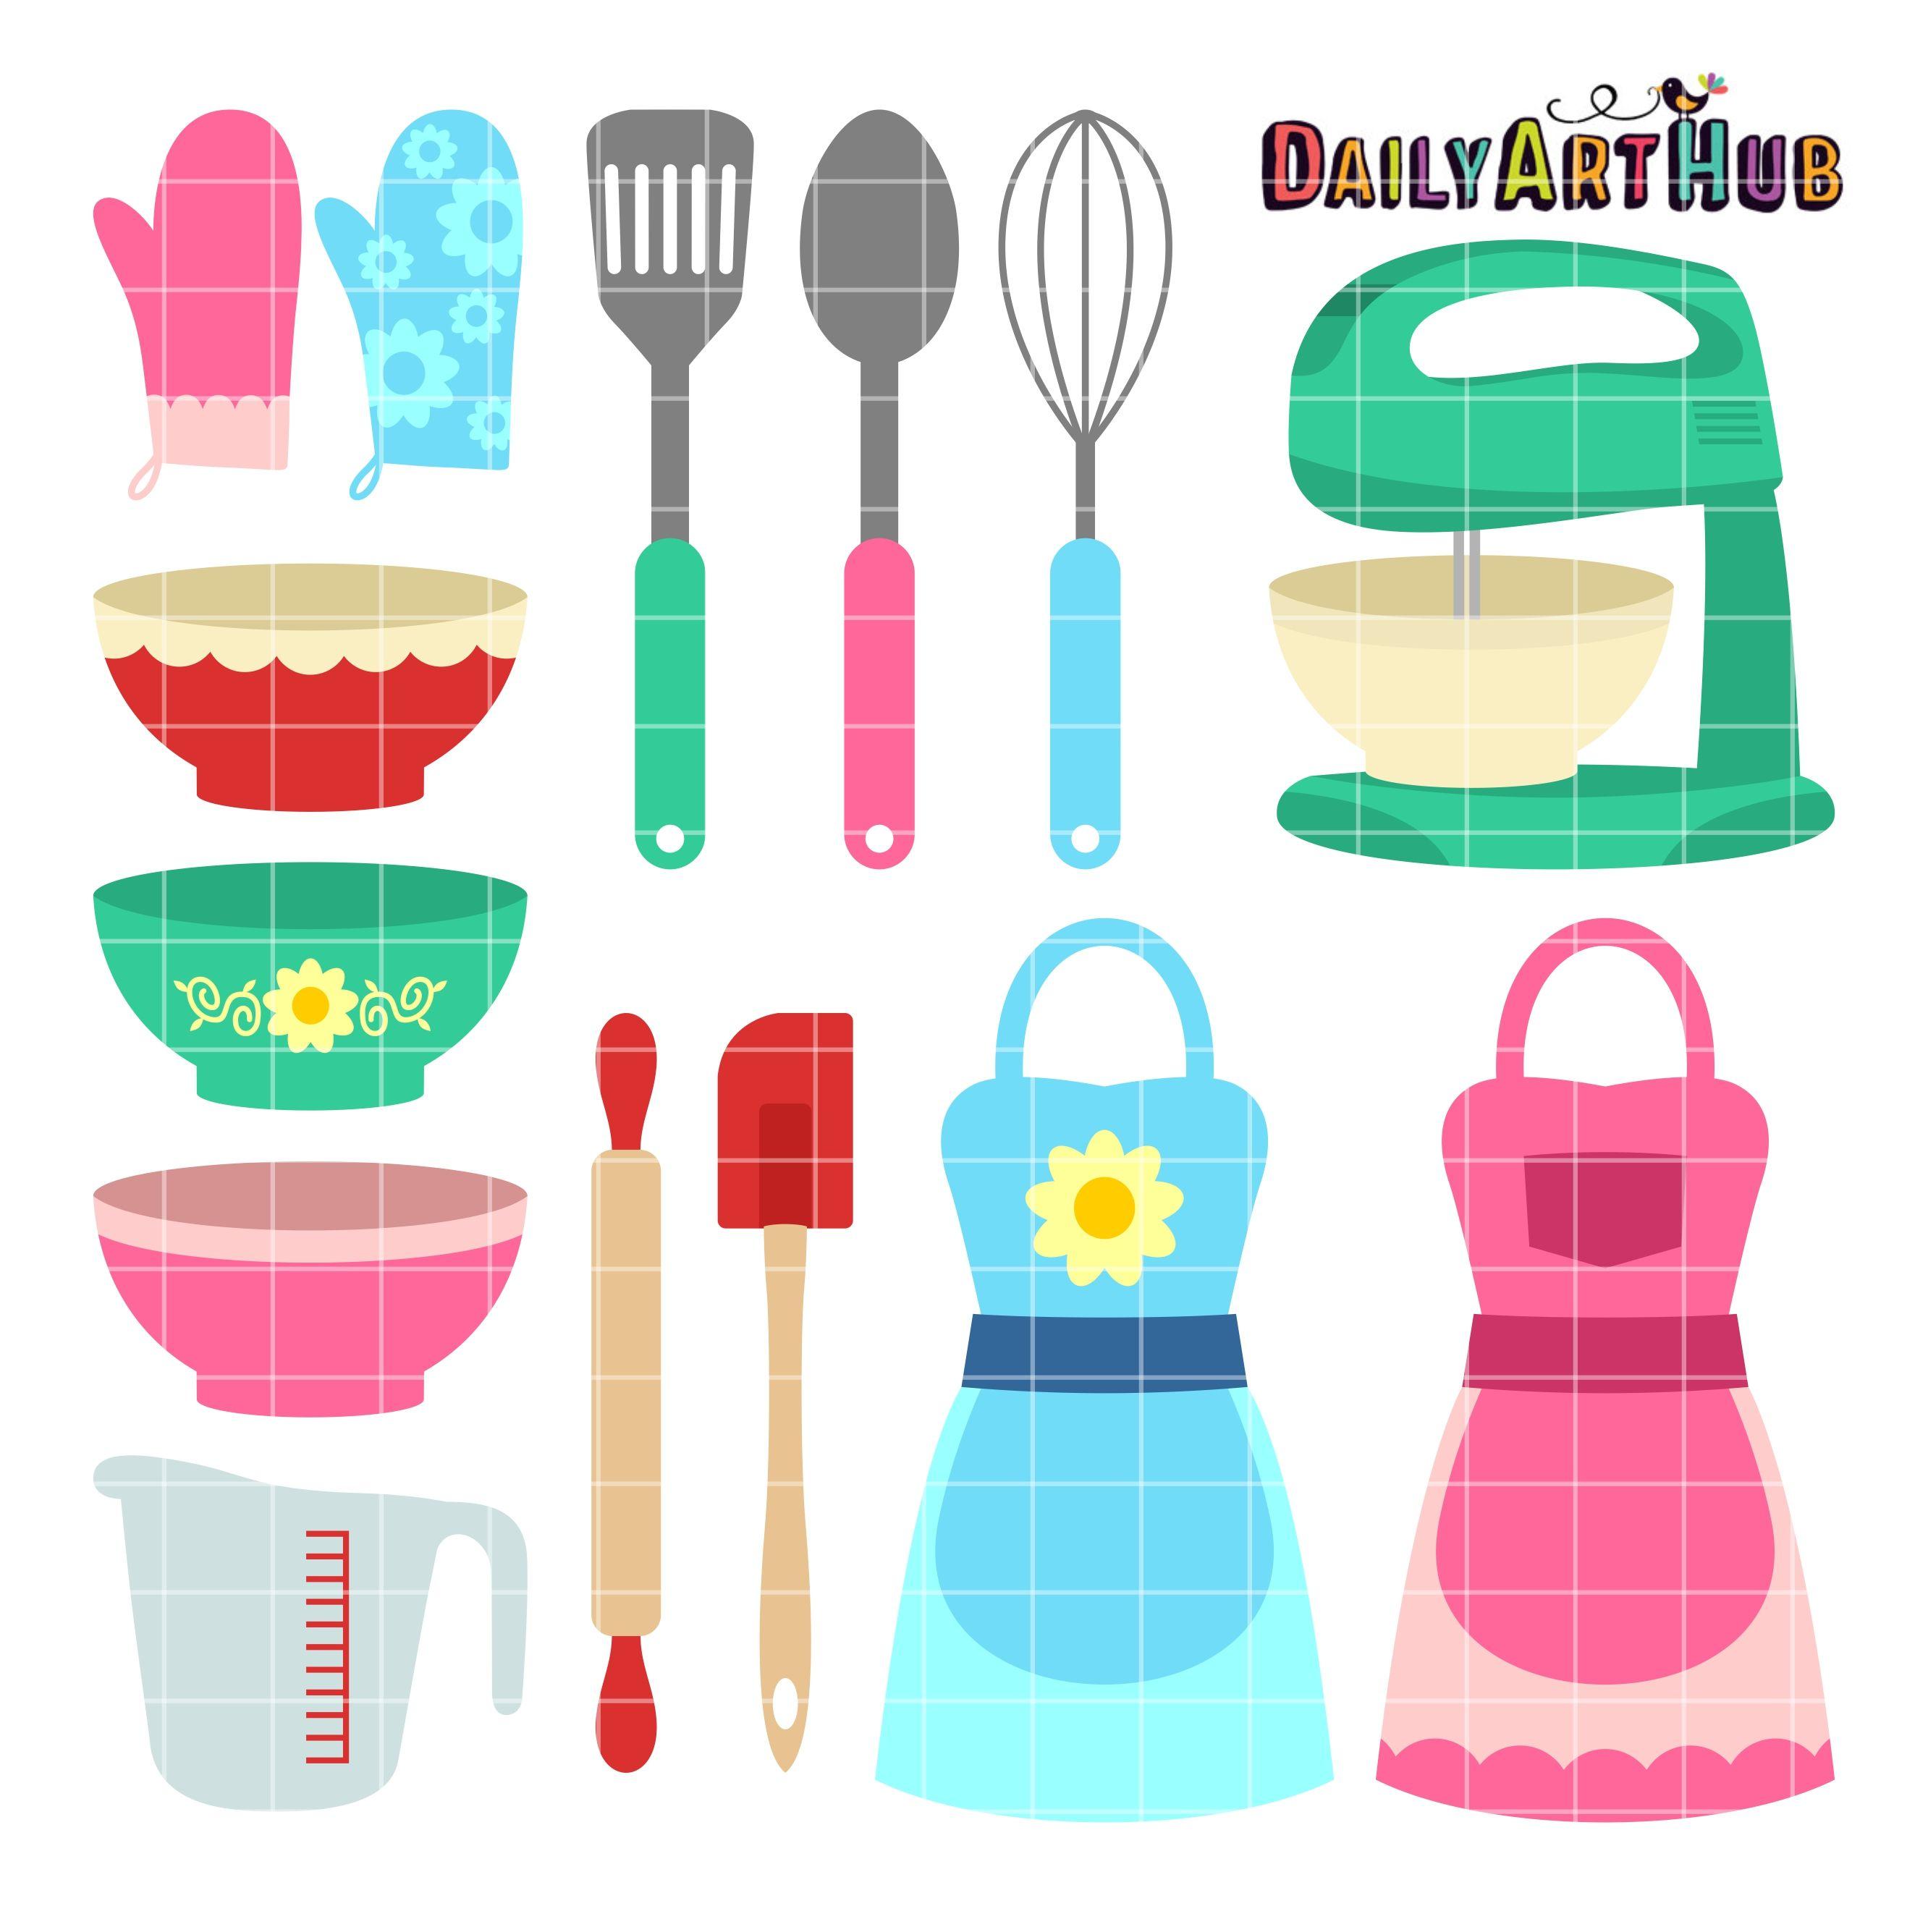 Cookbook clipart toy kitchen. Cute wares clip art